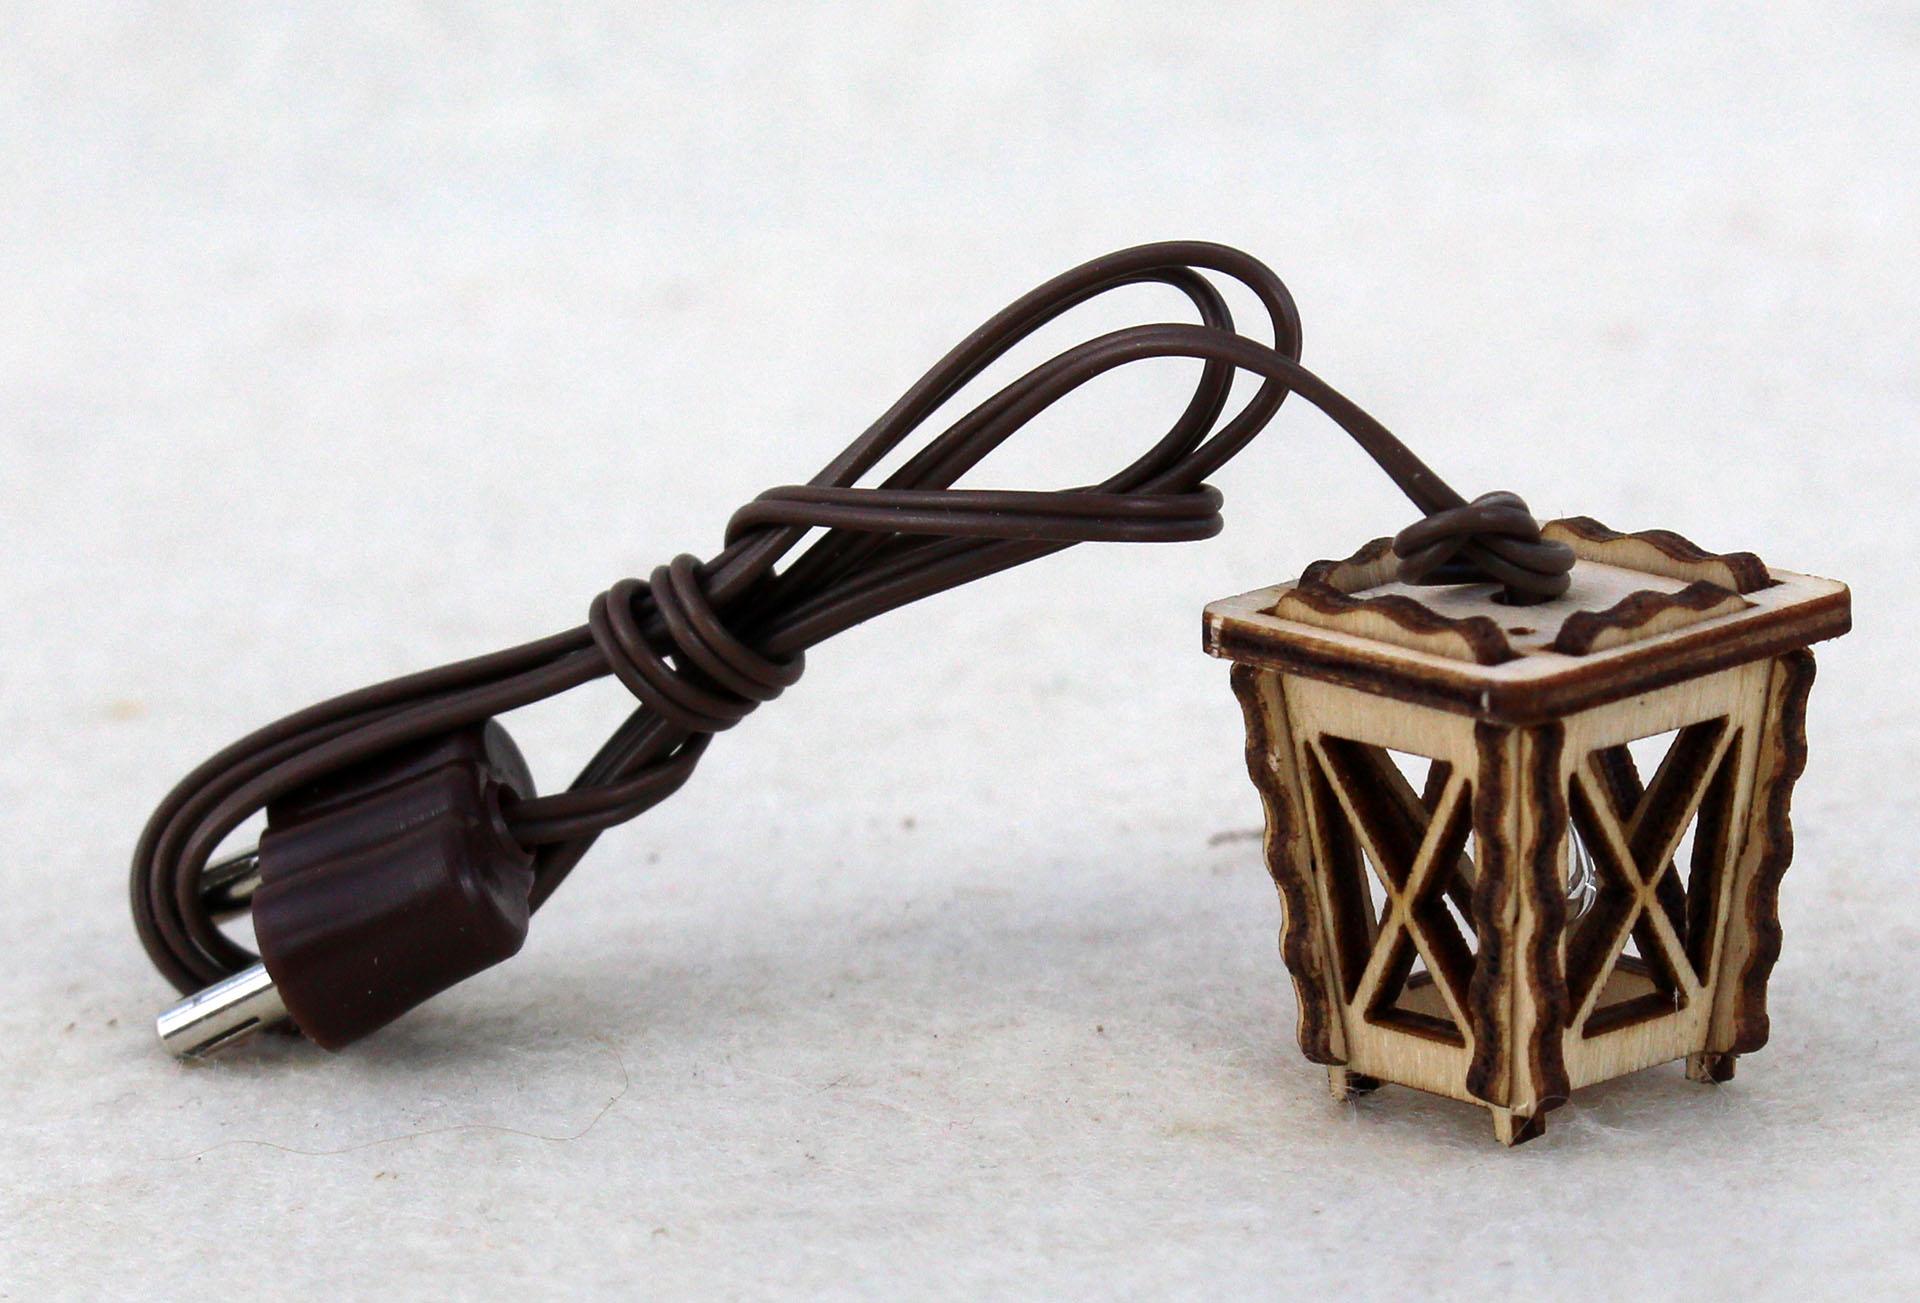 Holzlaterne mini weiß für Krippenbau